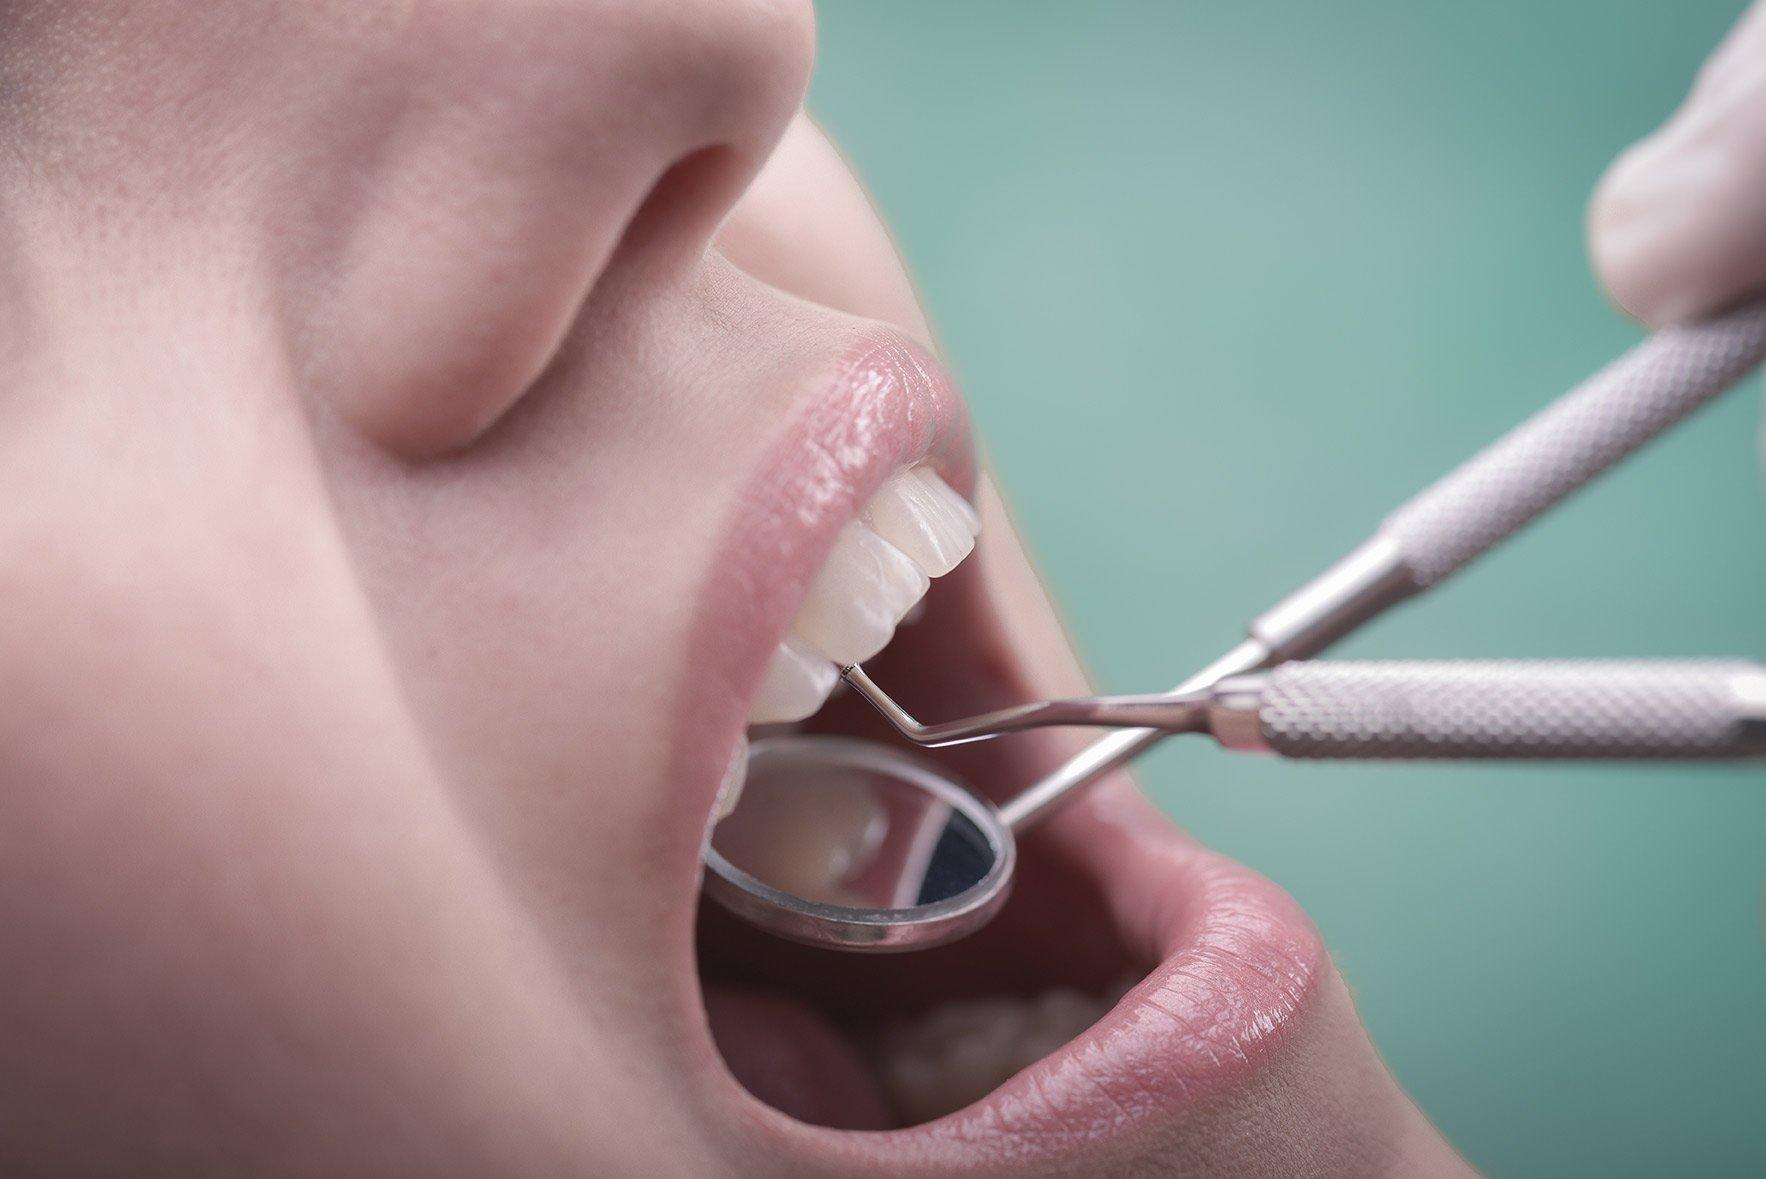 comforter now hilliard comfort reviews archives open dental img companies lexington office